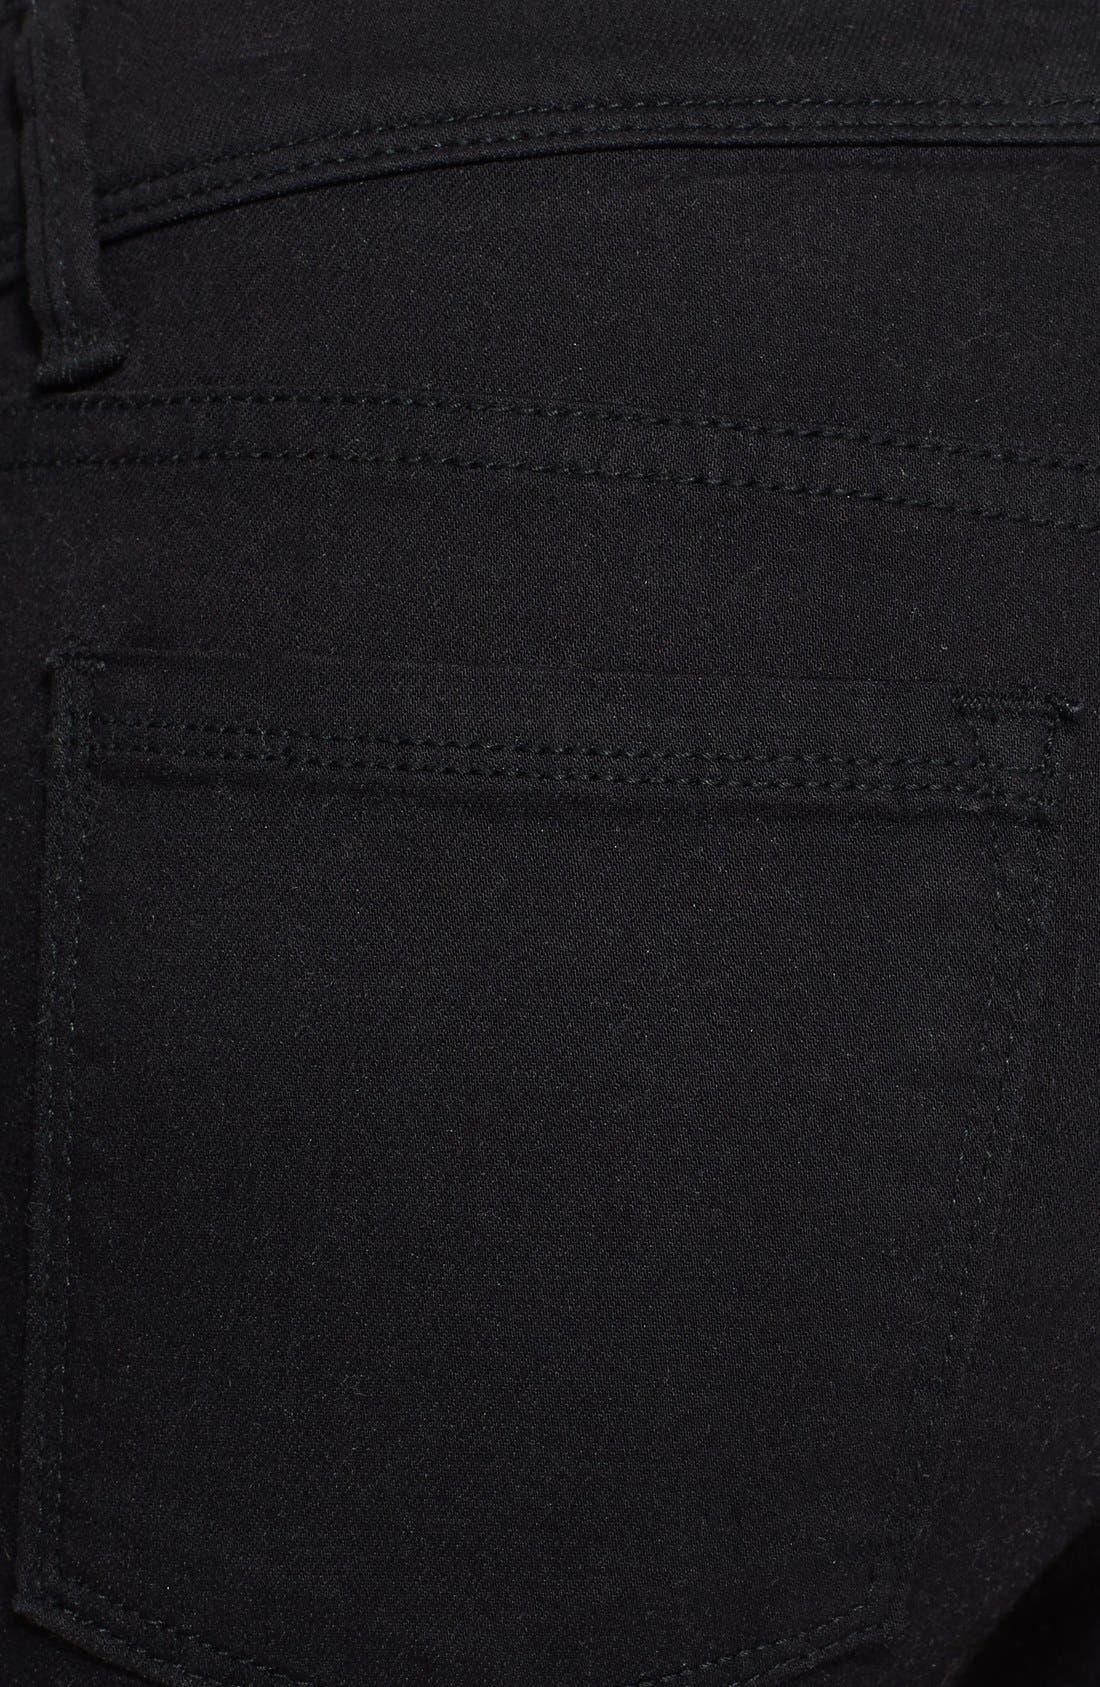 'Roller' Crop Skinny Jeans,                             Alternate thumbnail 3, color,                             Black